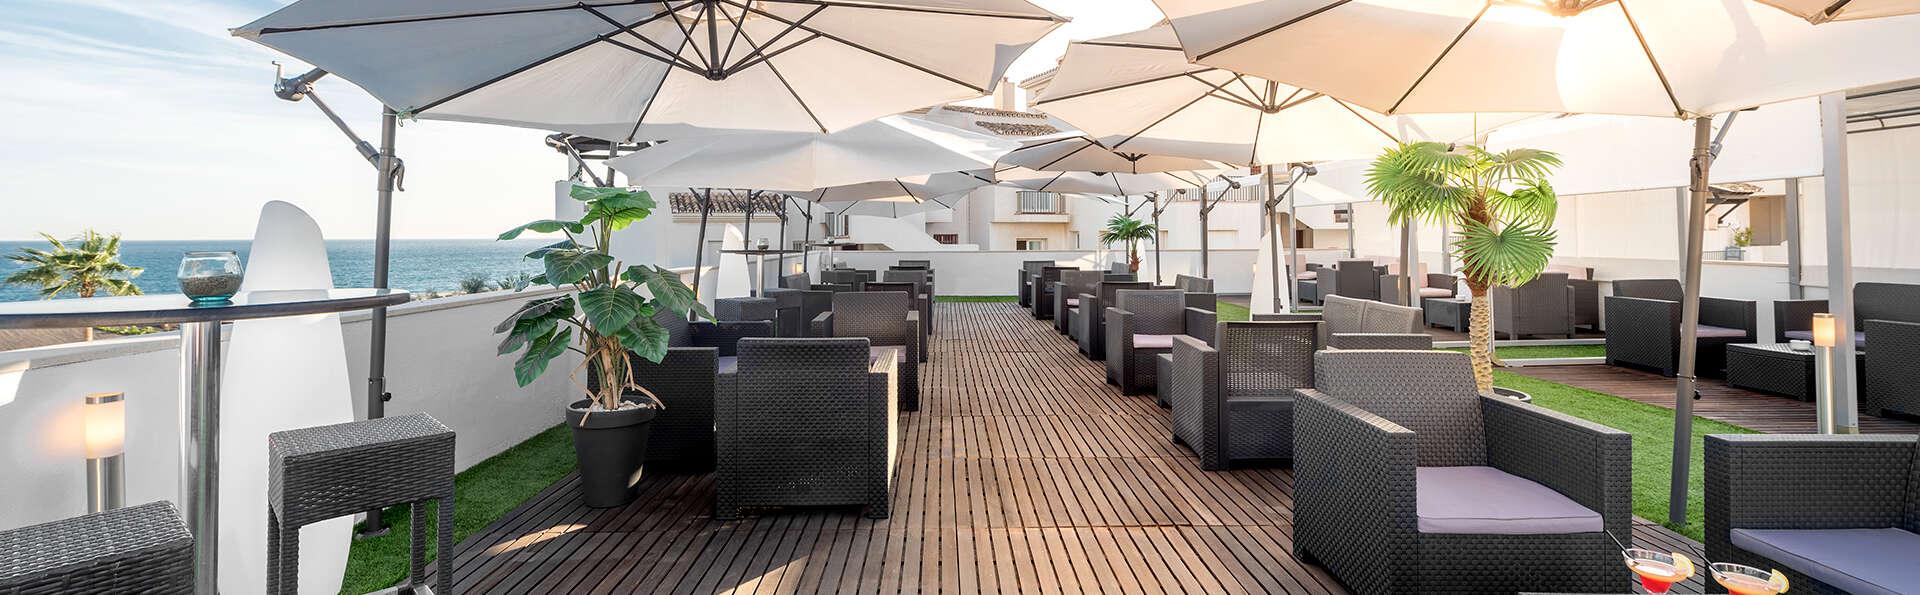 VIK Gran Hotel Costa Del Sol - EDIT_NEW_Terrace5.jpg